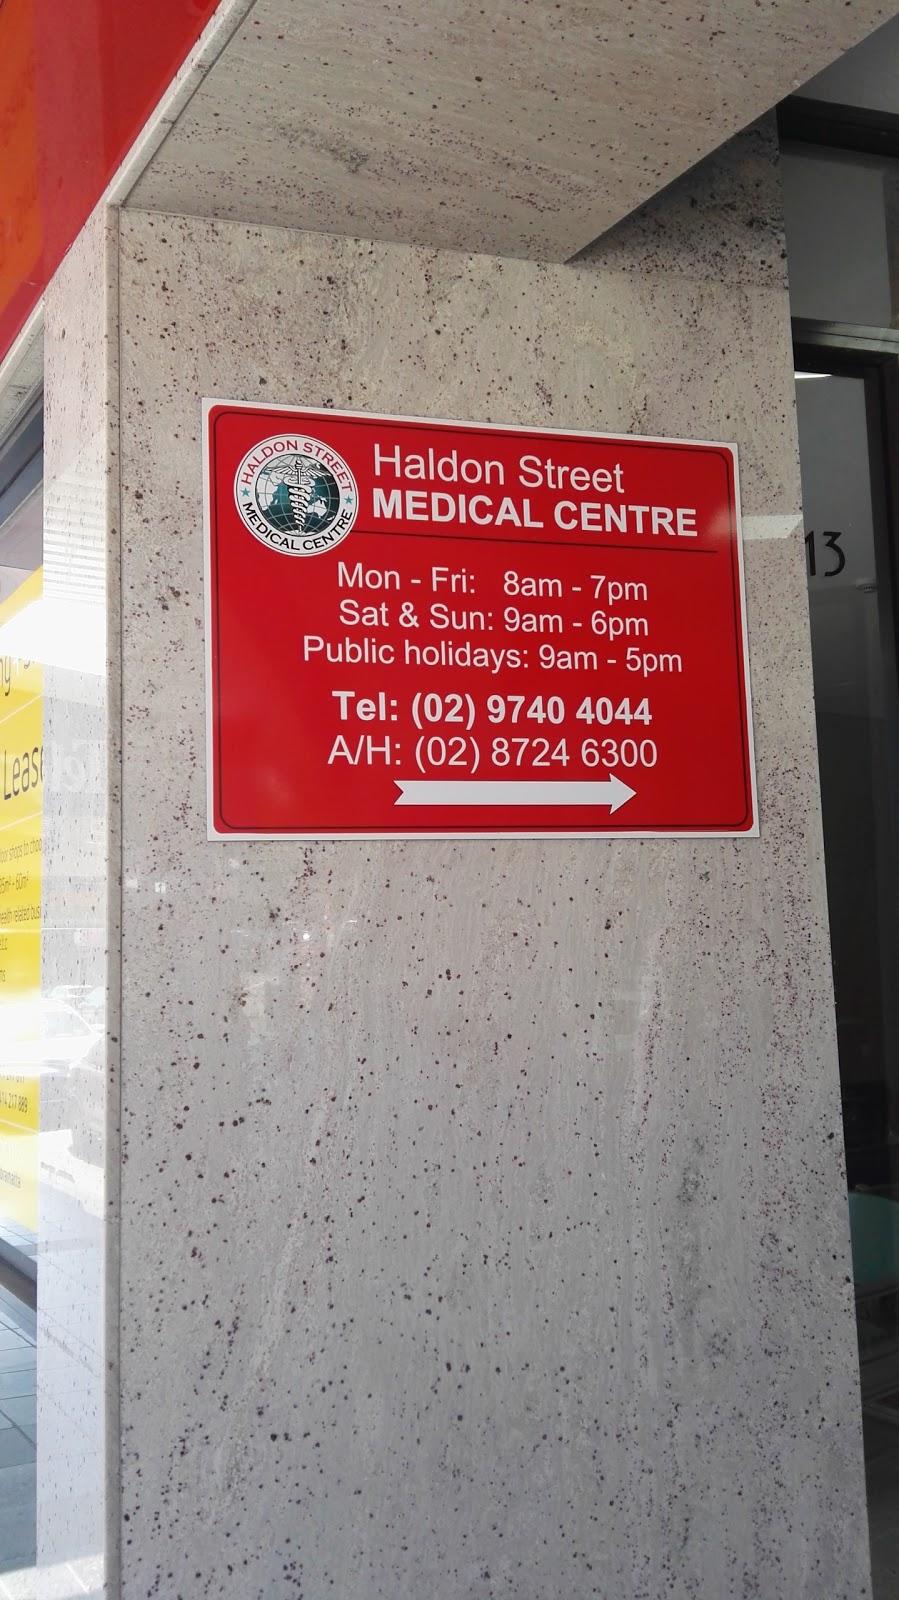 Haldon Street Medical Centre | health | 99/101 Haldon St, Lakemba NSW 2195, Australia | 0297404044 OR +61 2 9740 4044